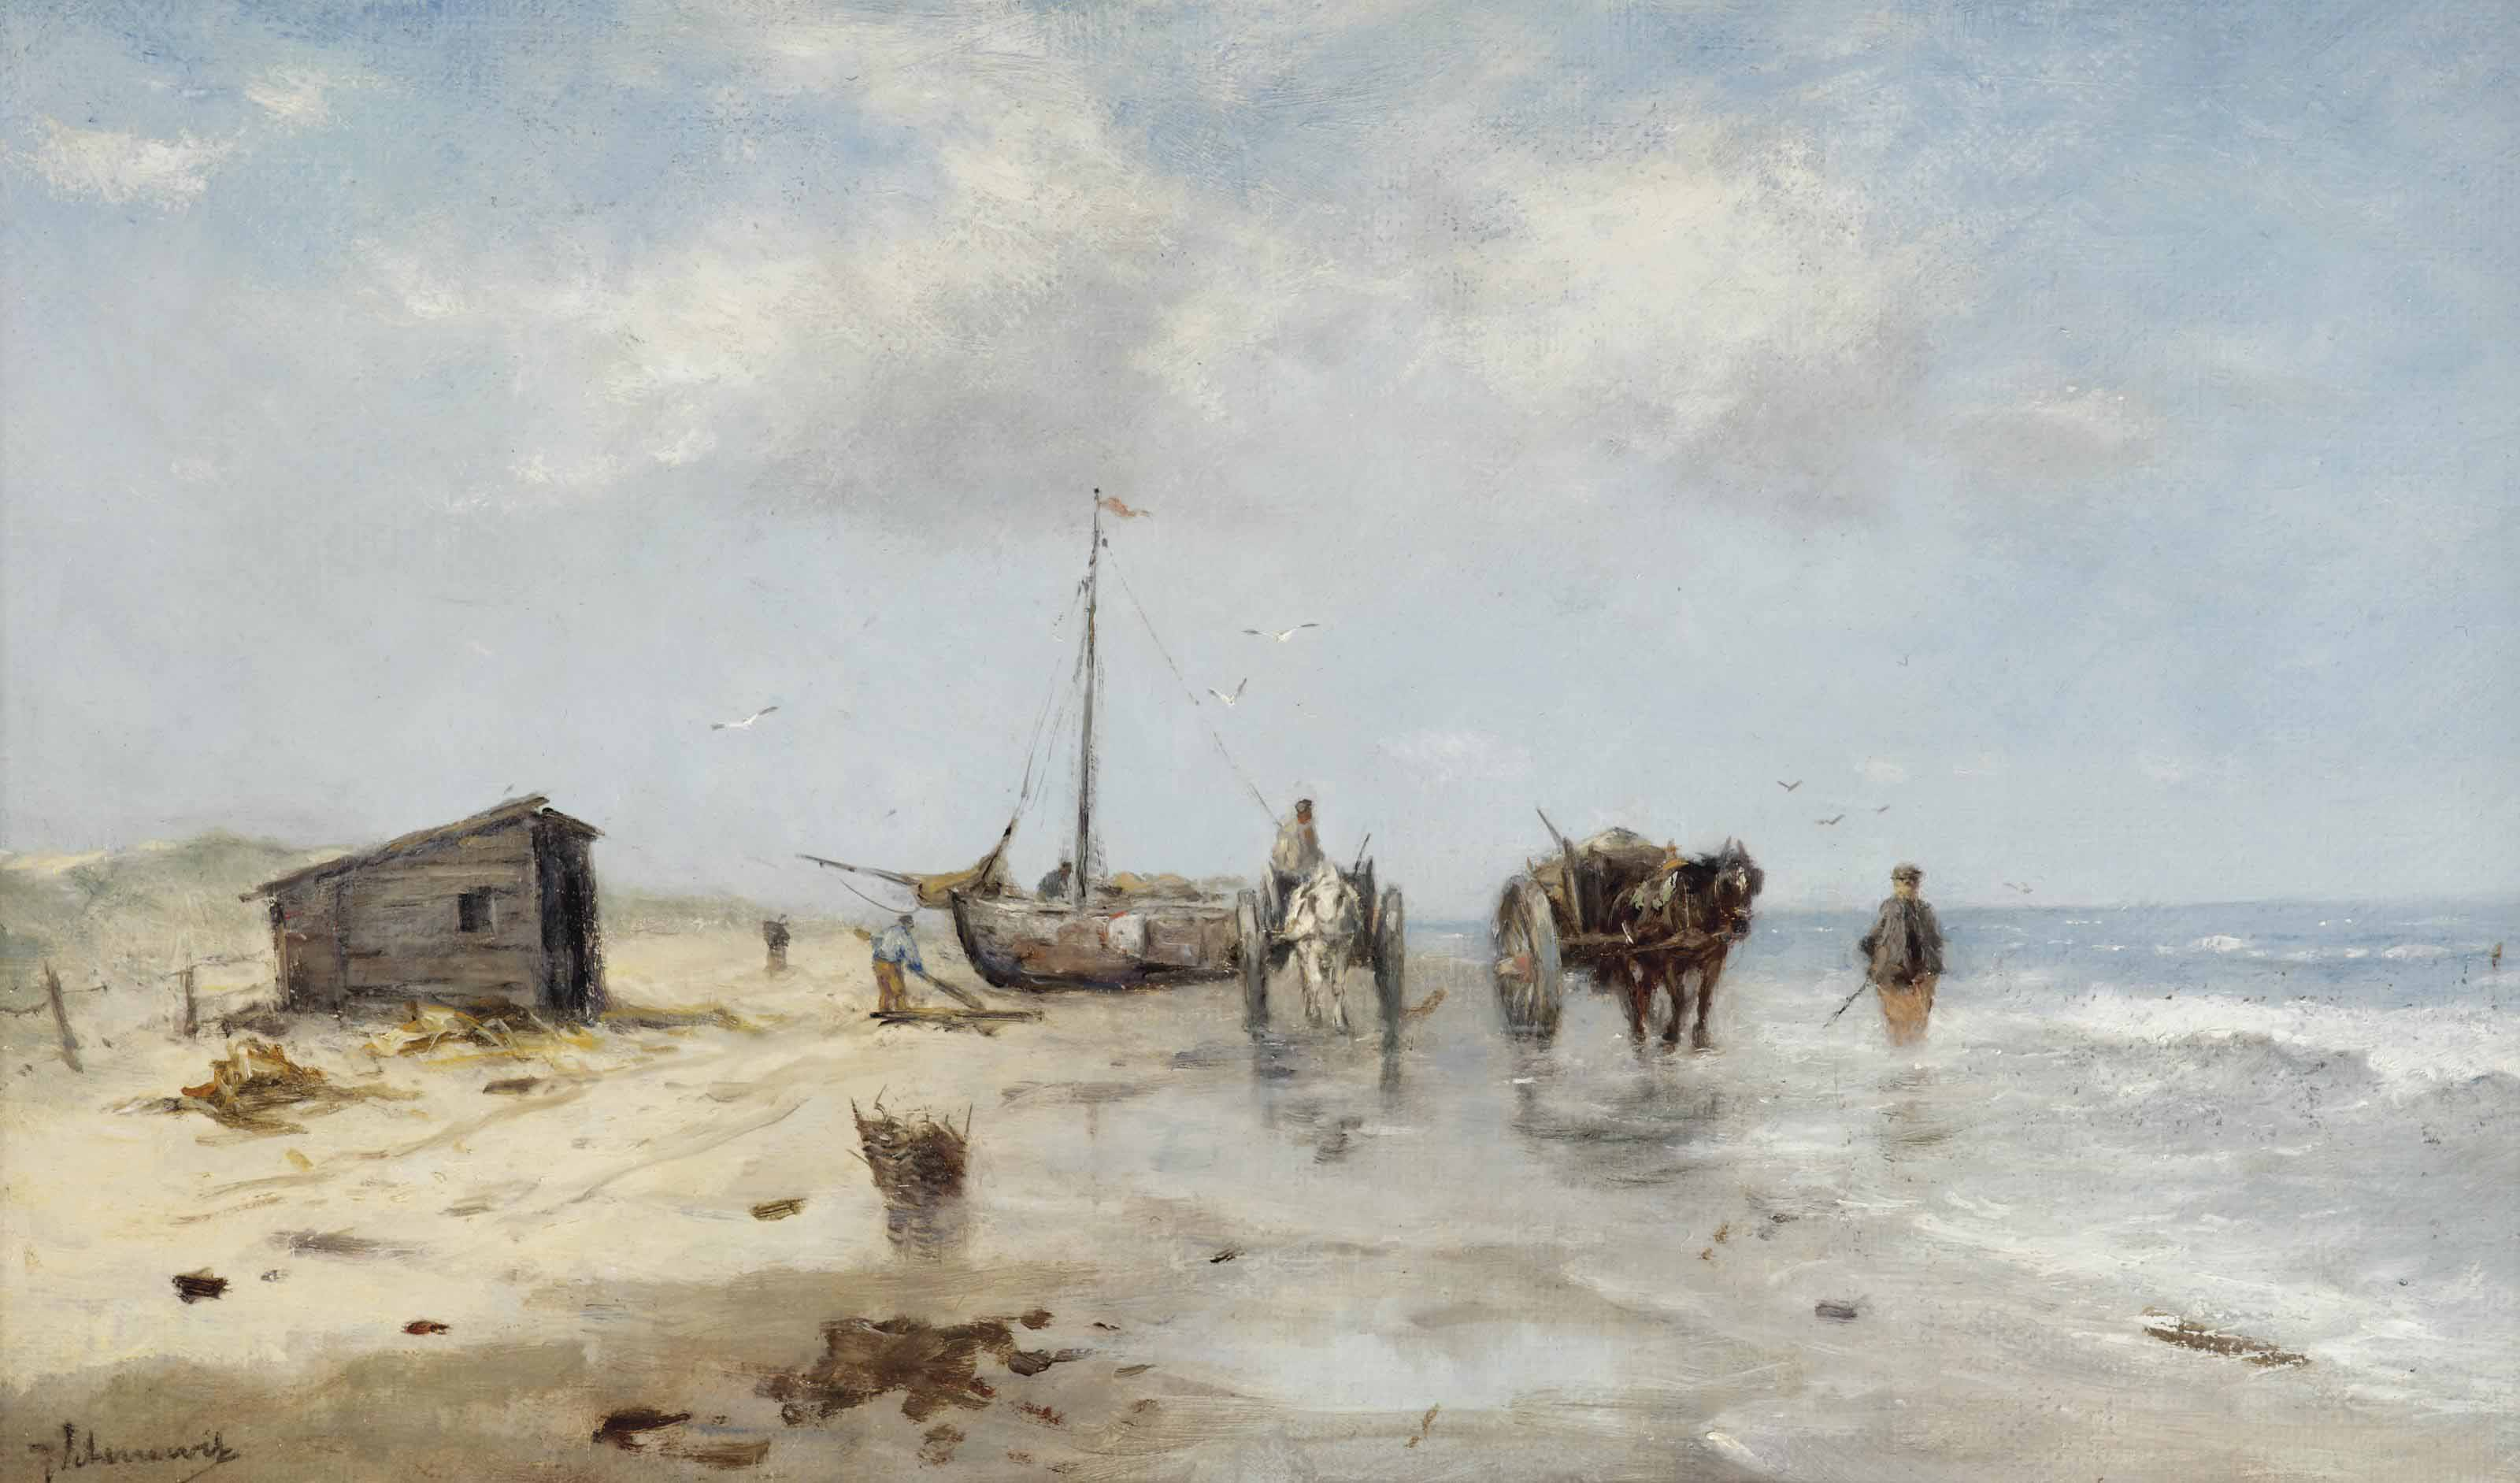 Schellfishers on the beach